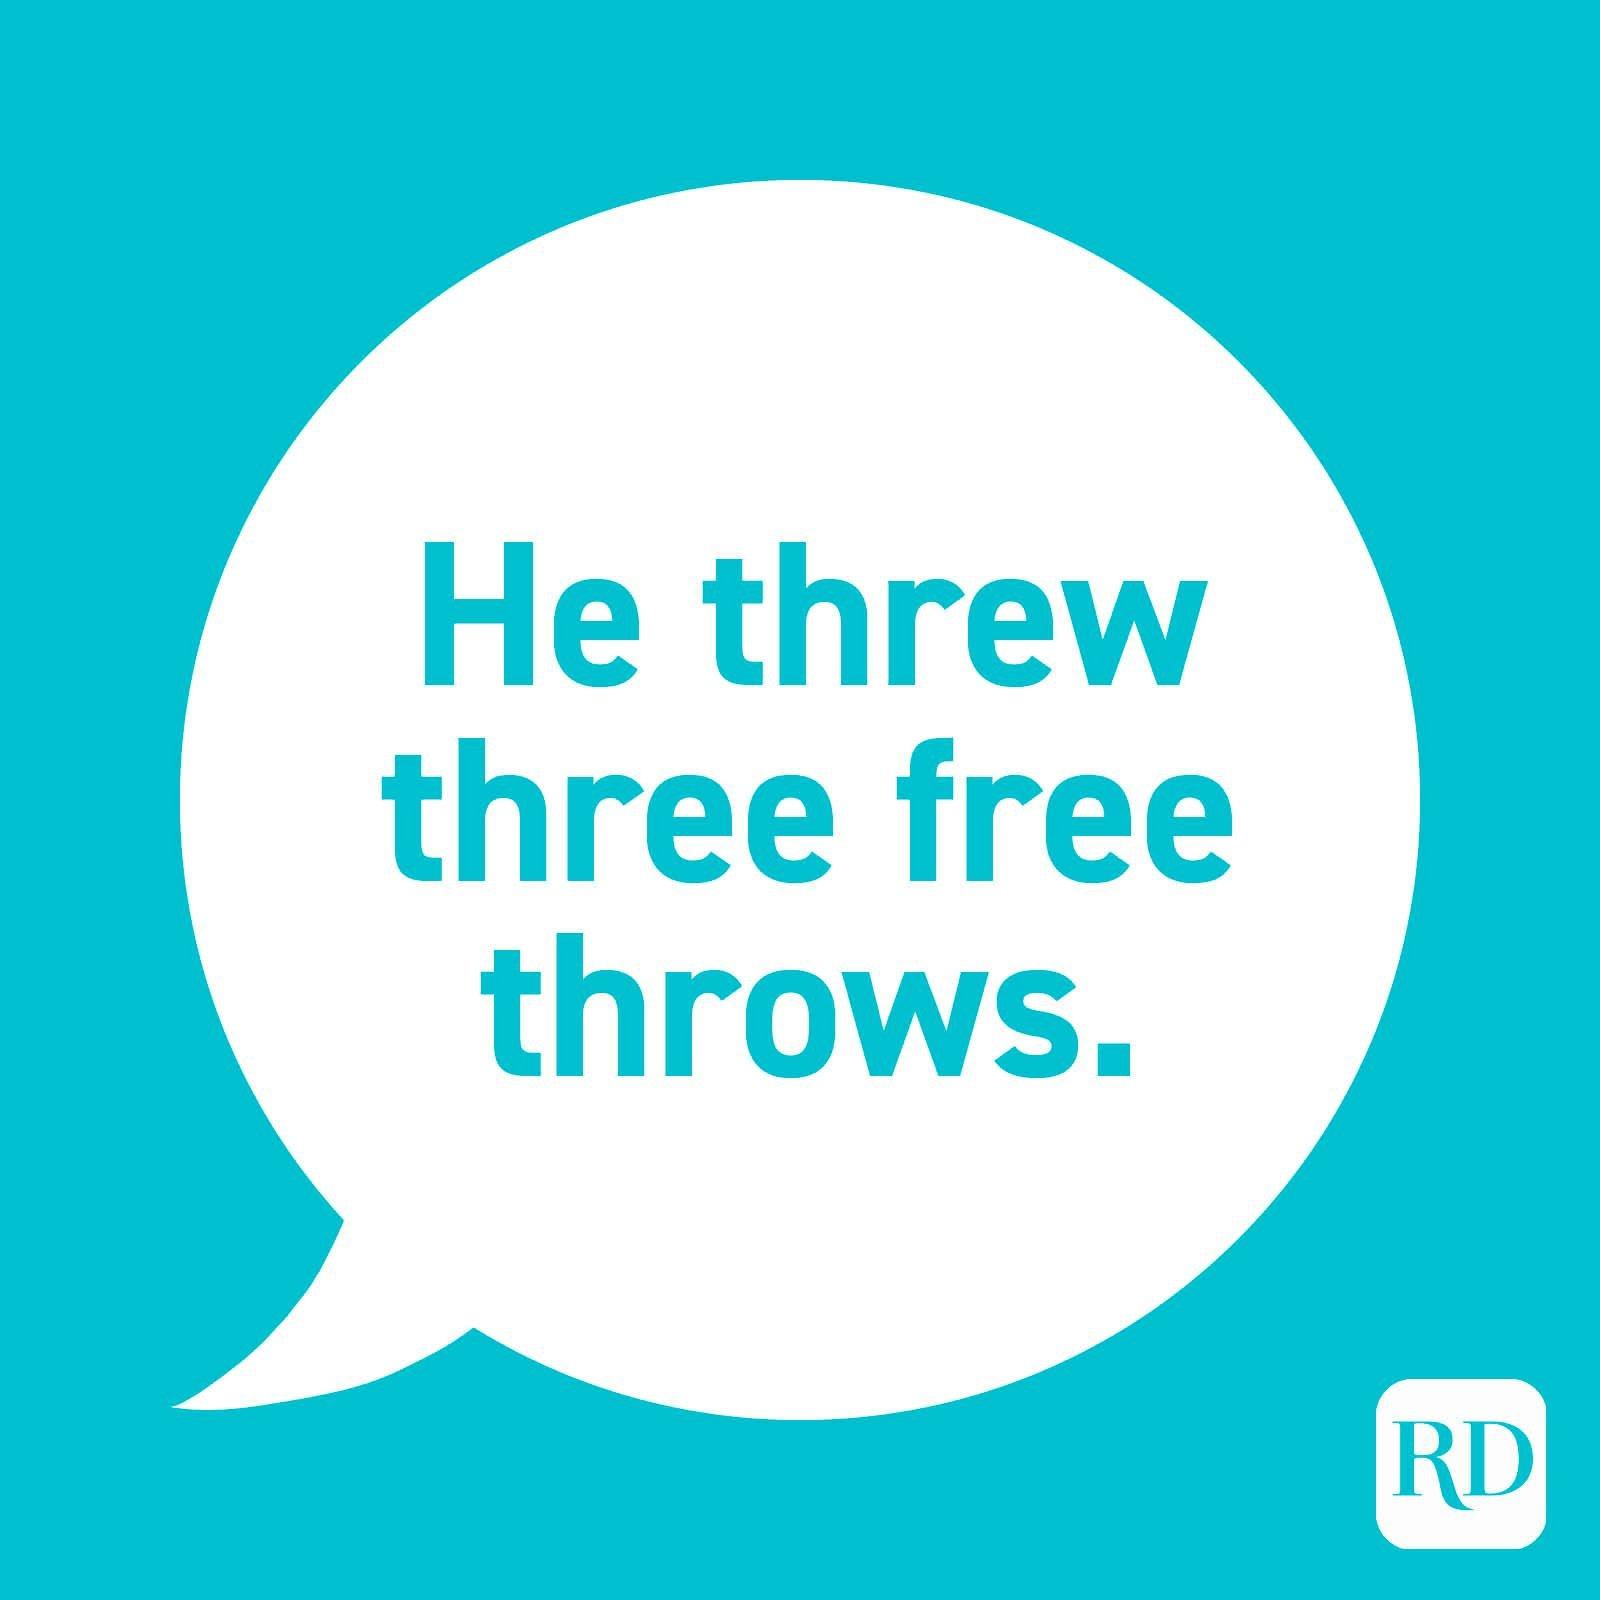 """He threw three free throws."""